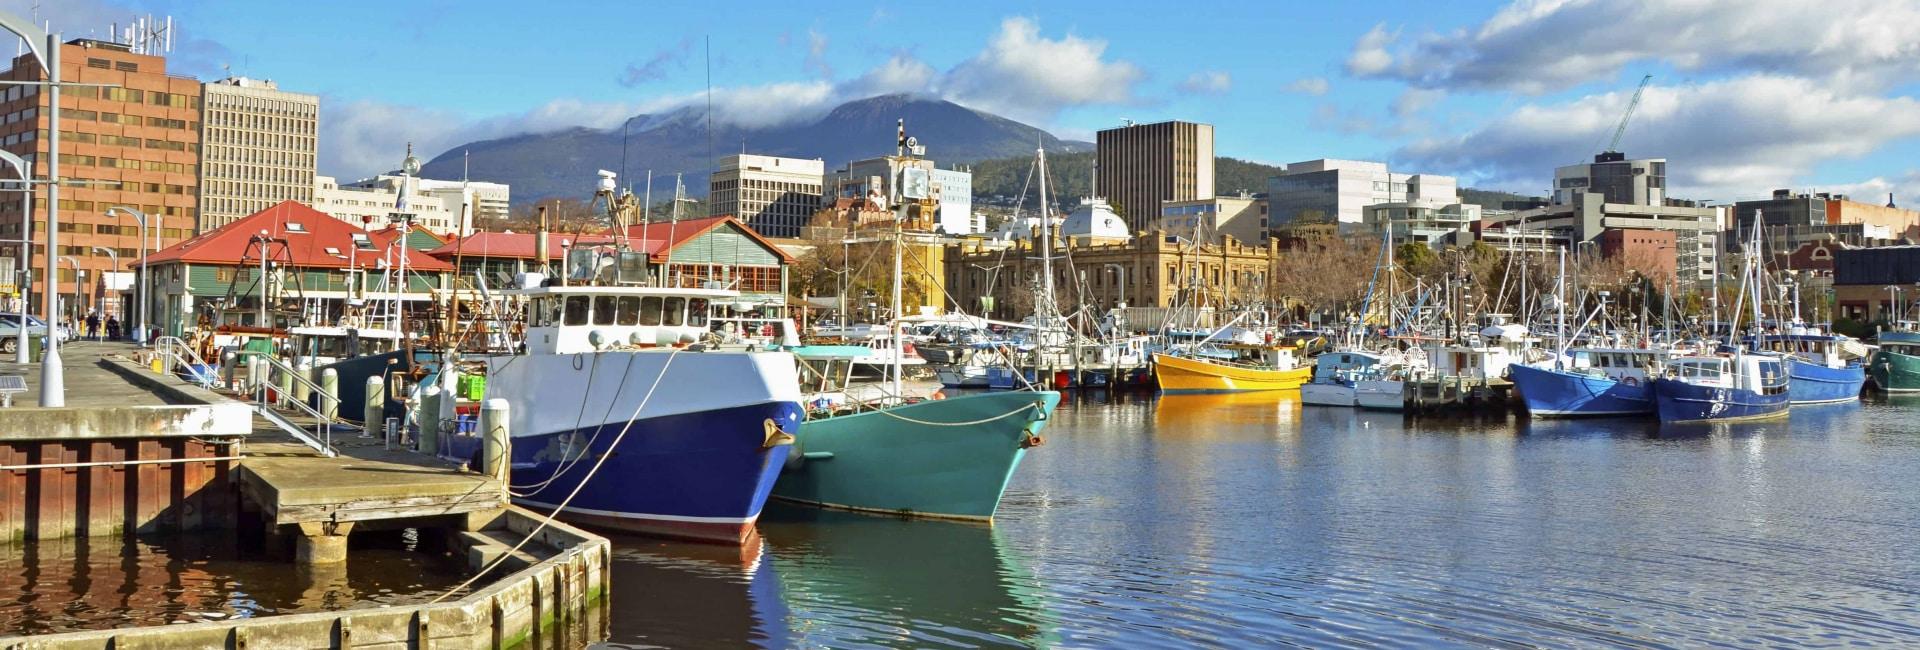 Hobart i Tasmanien, Australien